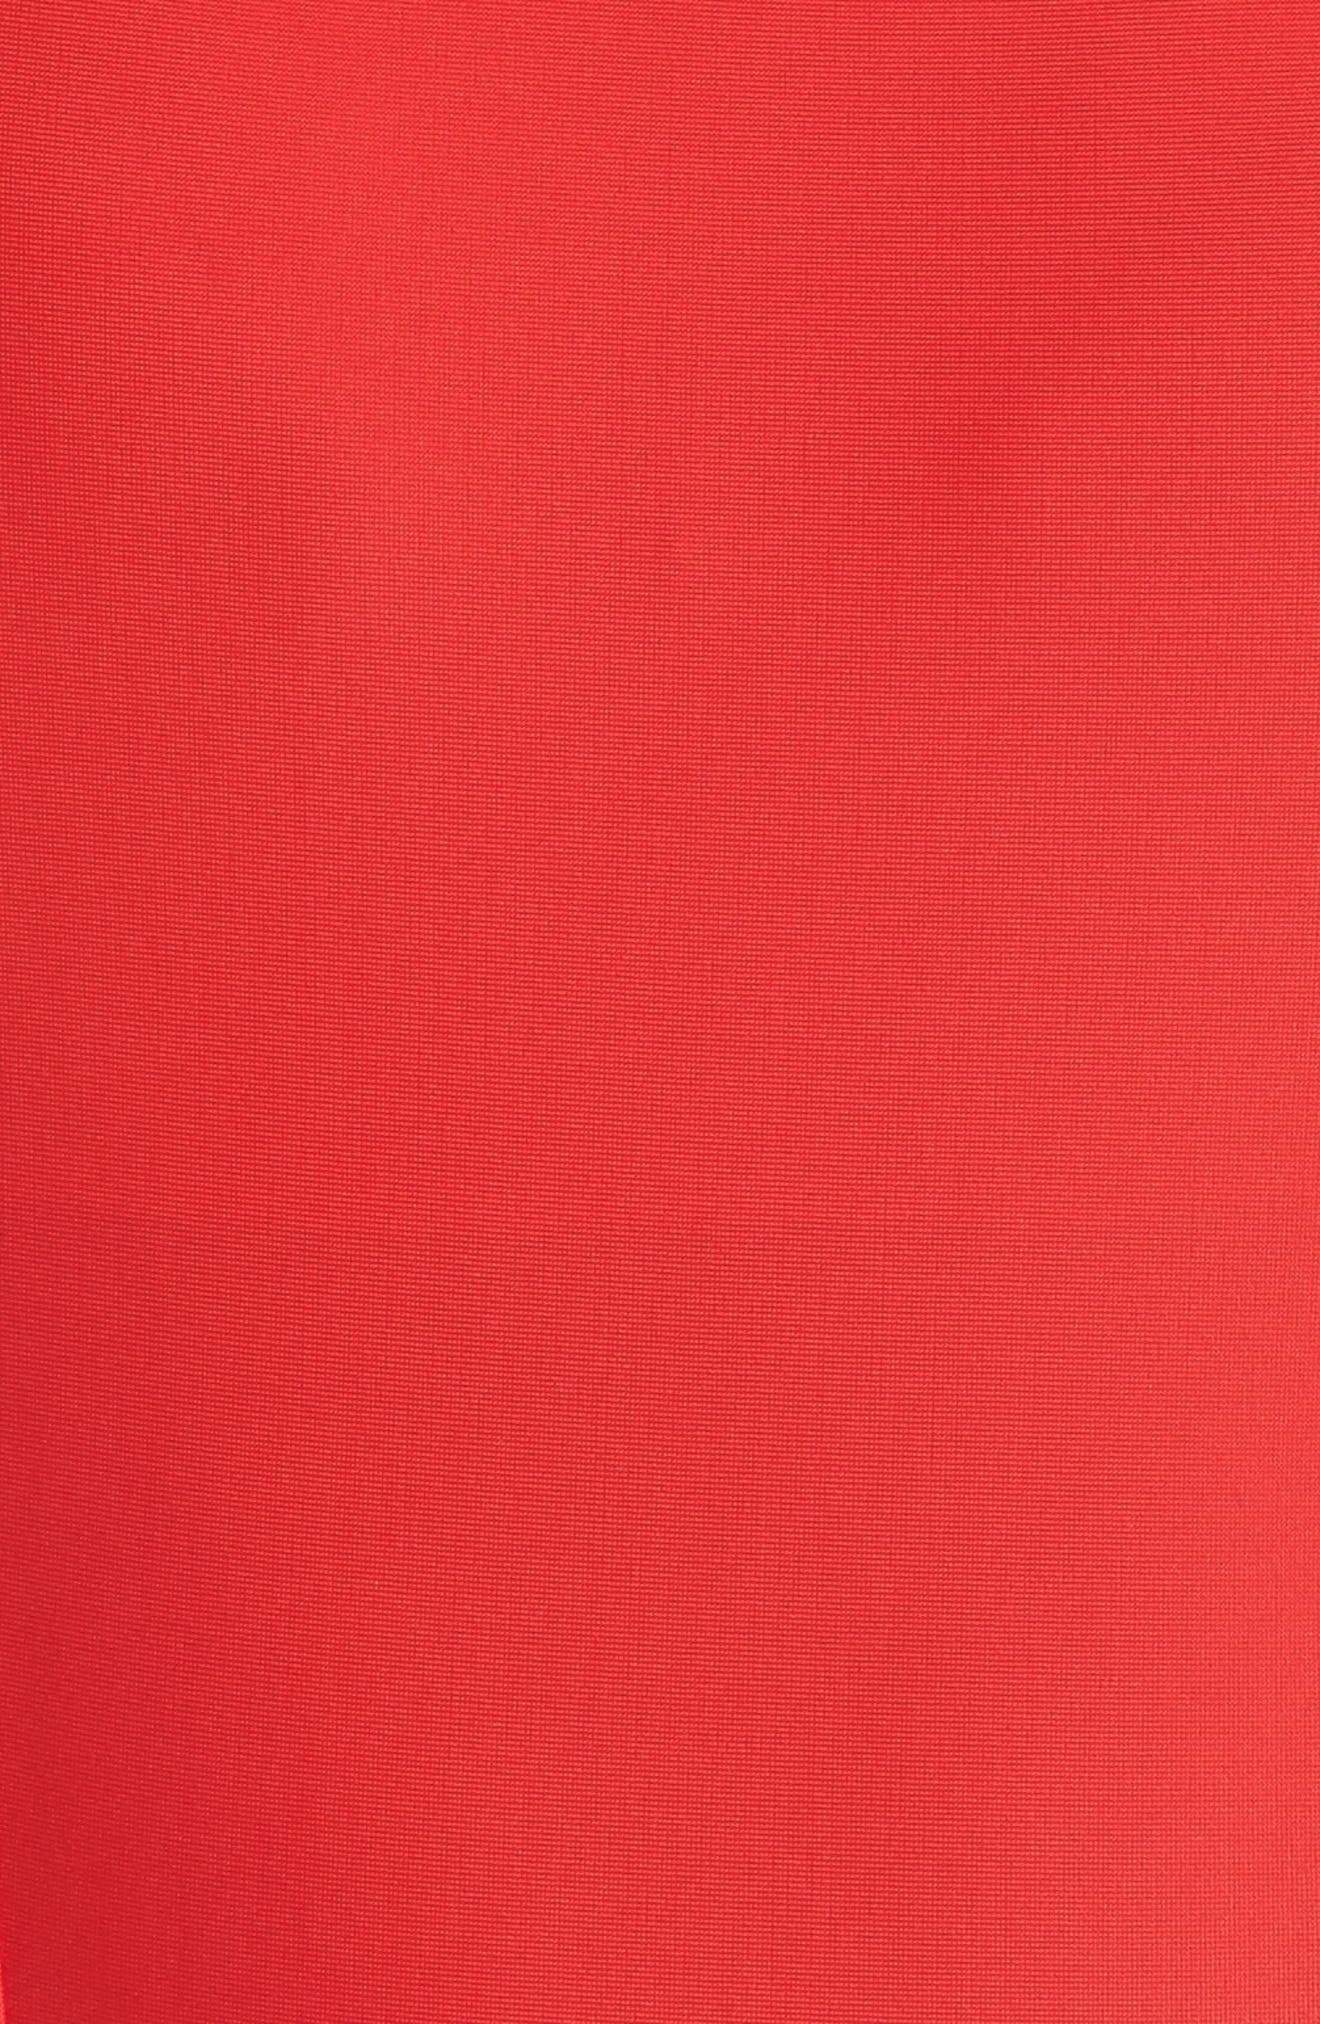 Saldana One-Piece Cutout Swimsuit,                             Alternate thumbnail 5, color,                             Red